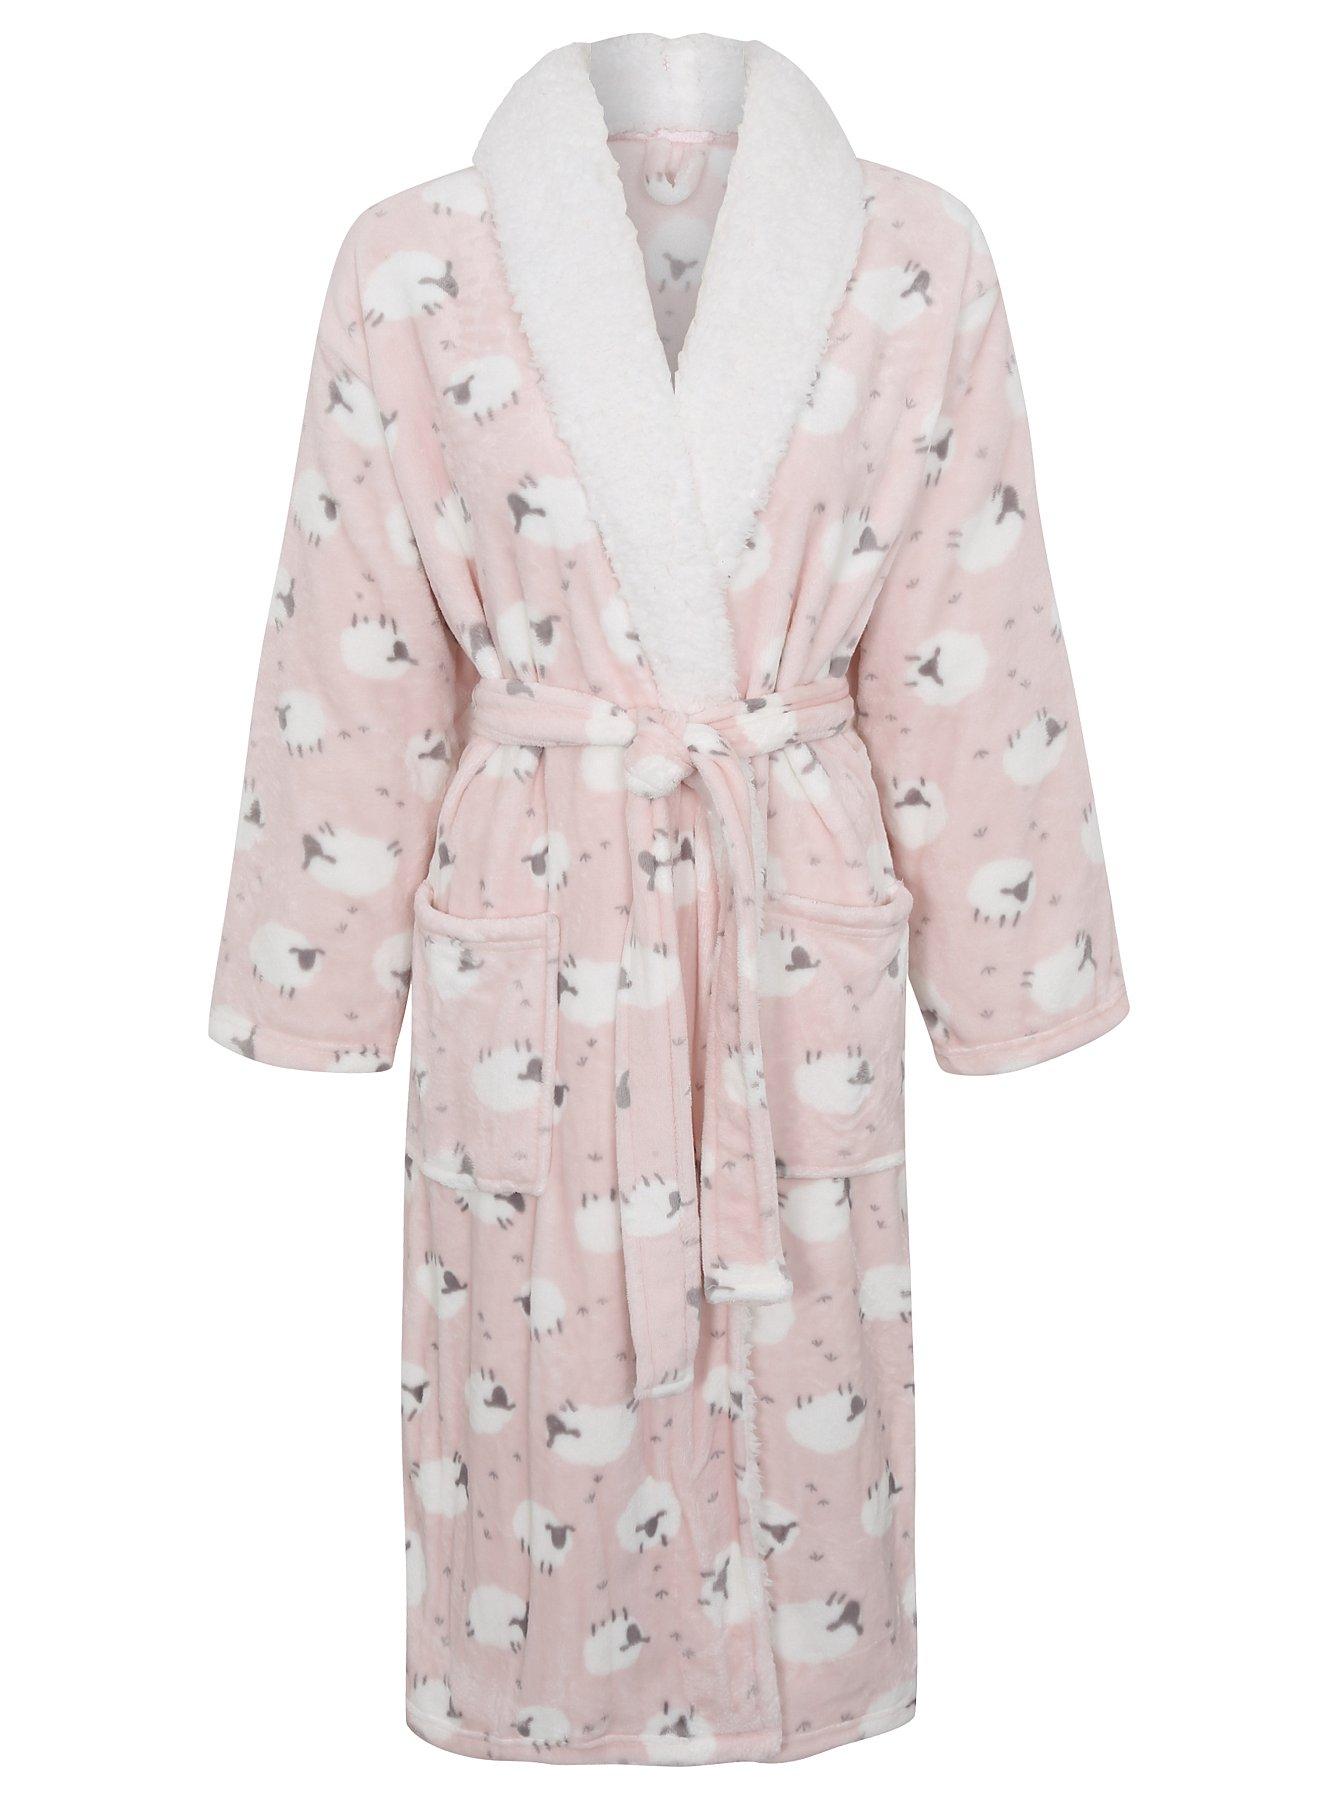 Sheep Print Fleece Dressing Gown | Women | George at ASDA